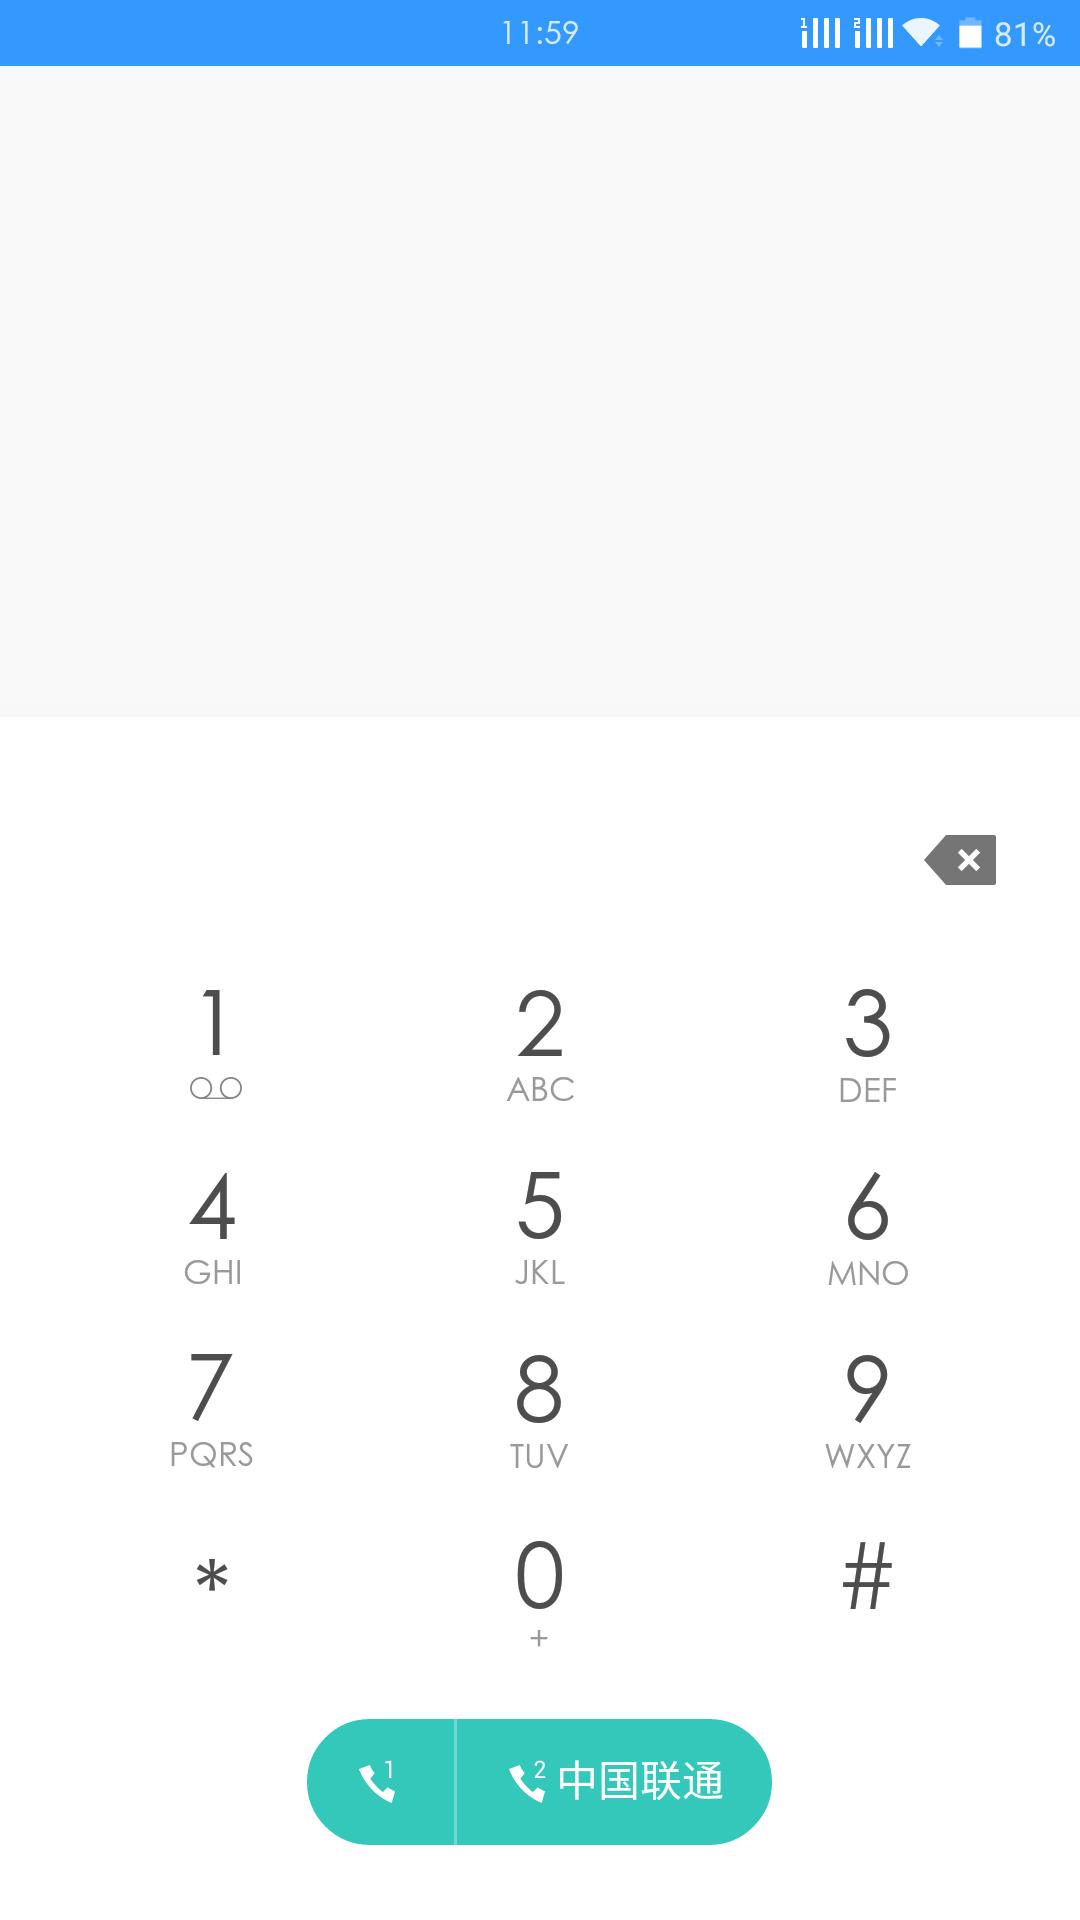 Screenshot_2015-10-03-11-59-47.png